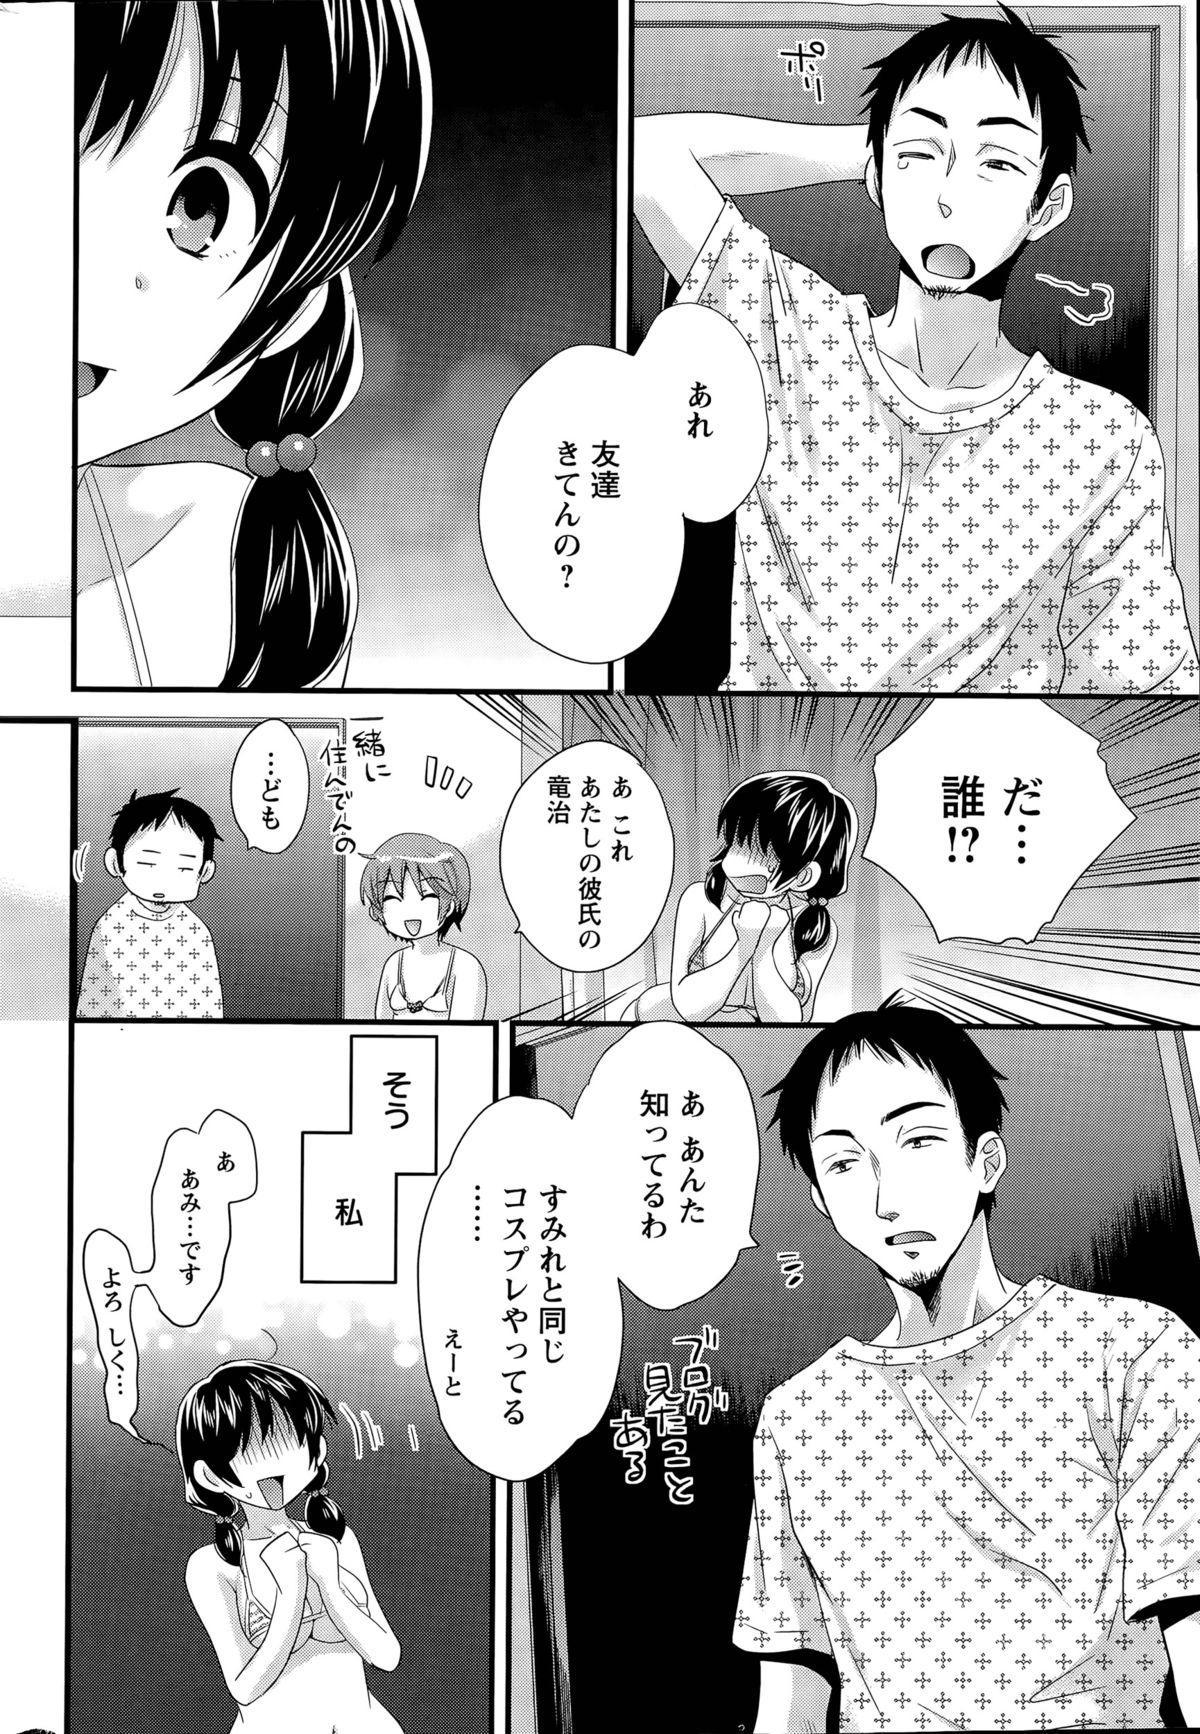 [Pon Takahanada] Otani-san no Cosplay Jijou Ch. 1-5 41